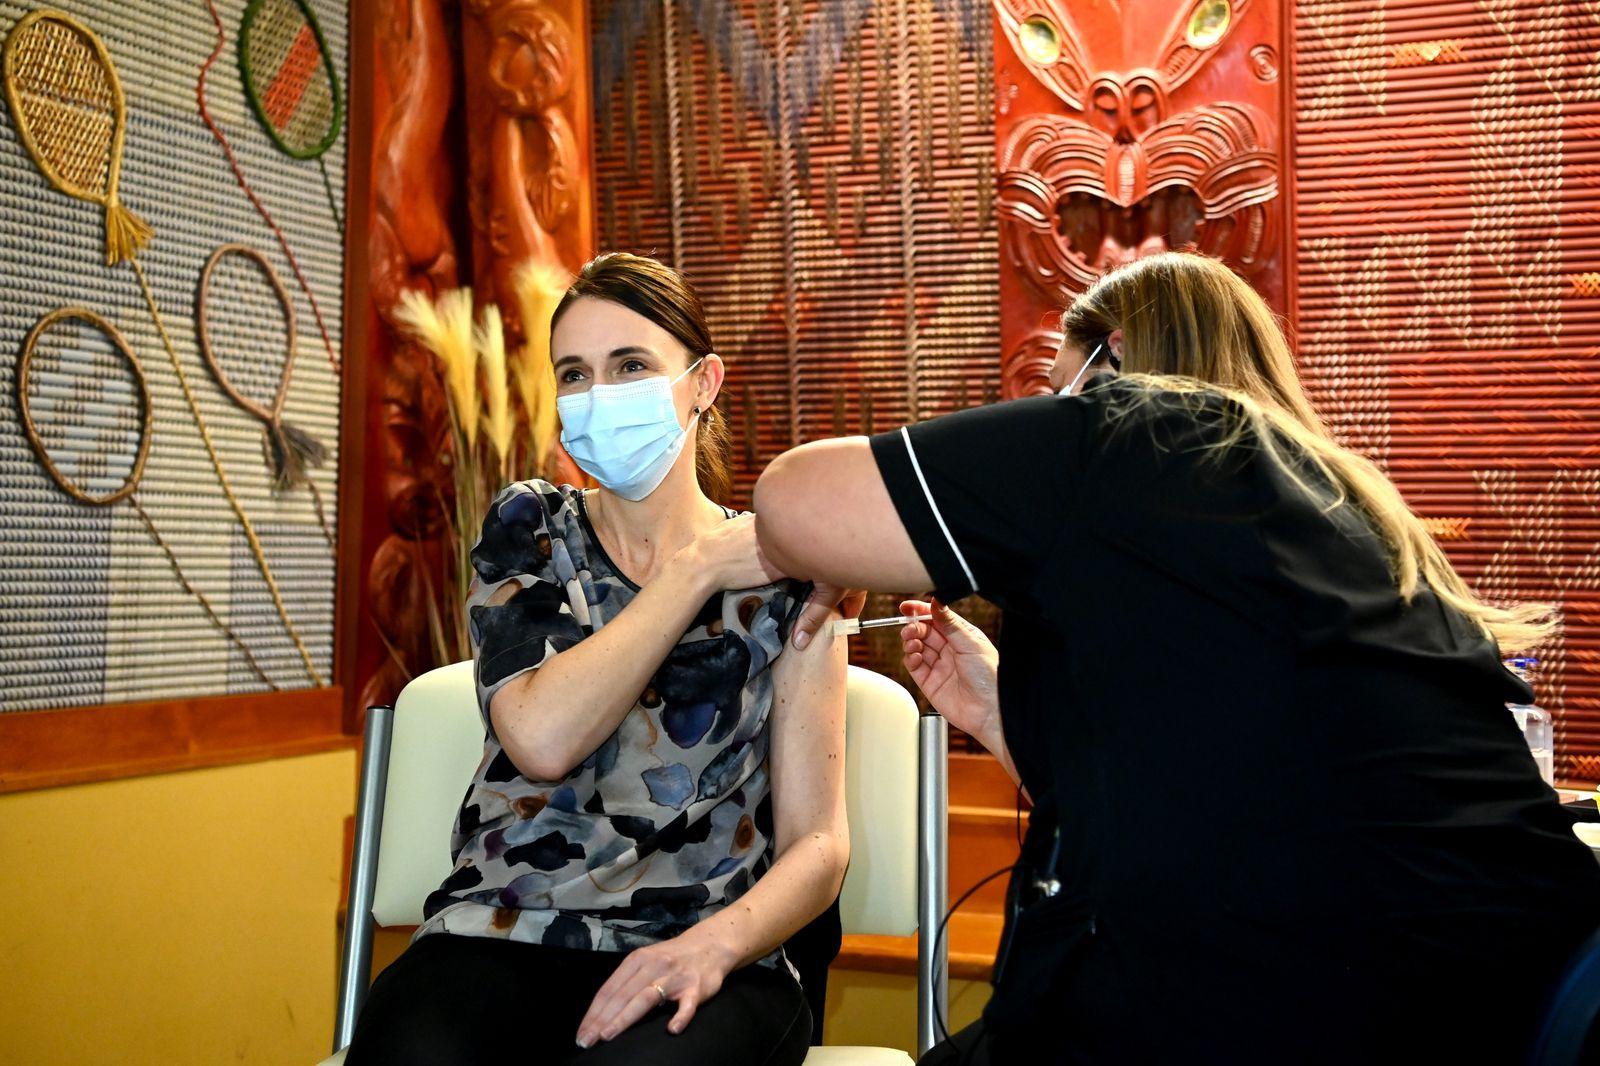 New Zealand Prime Minister Jacinda Ardern Receives Covid-19 Vaccine